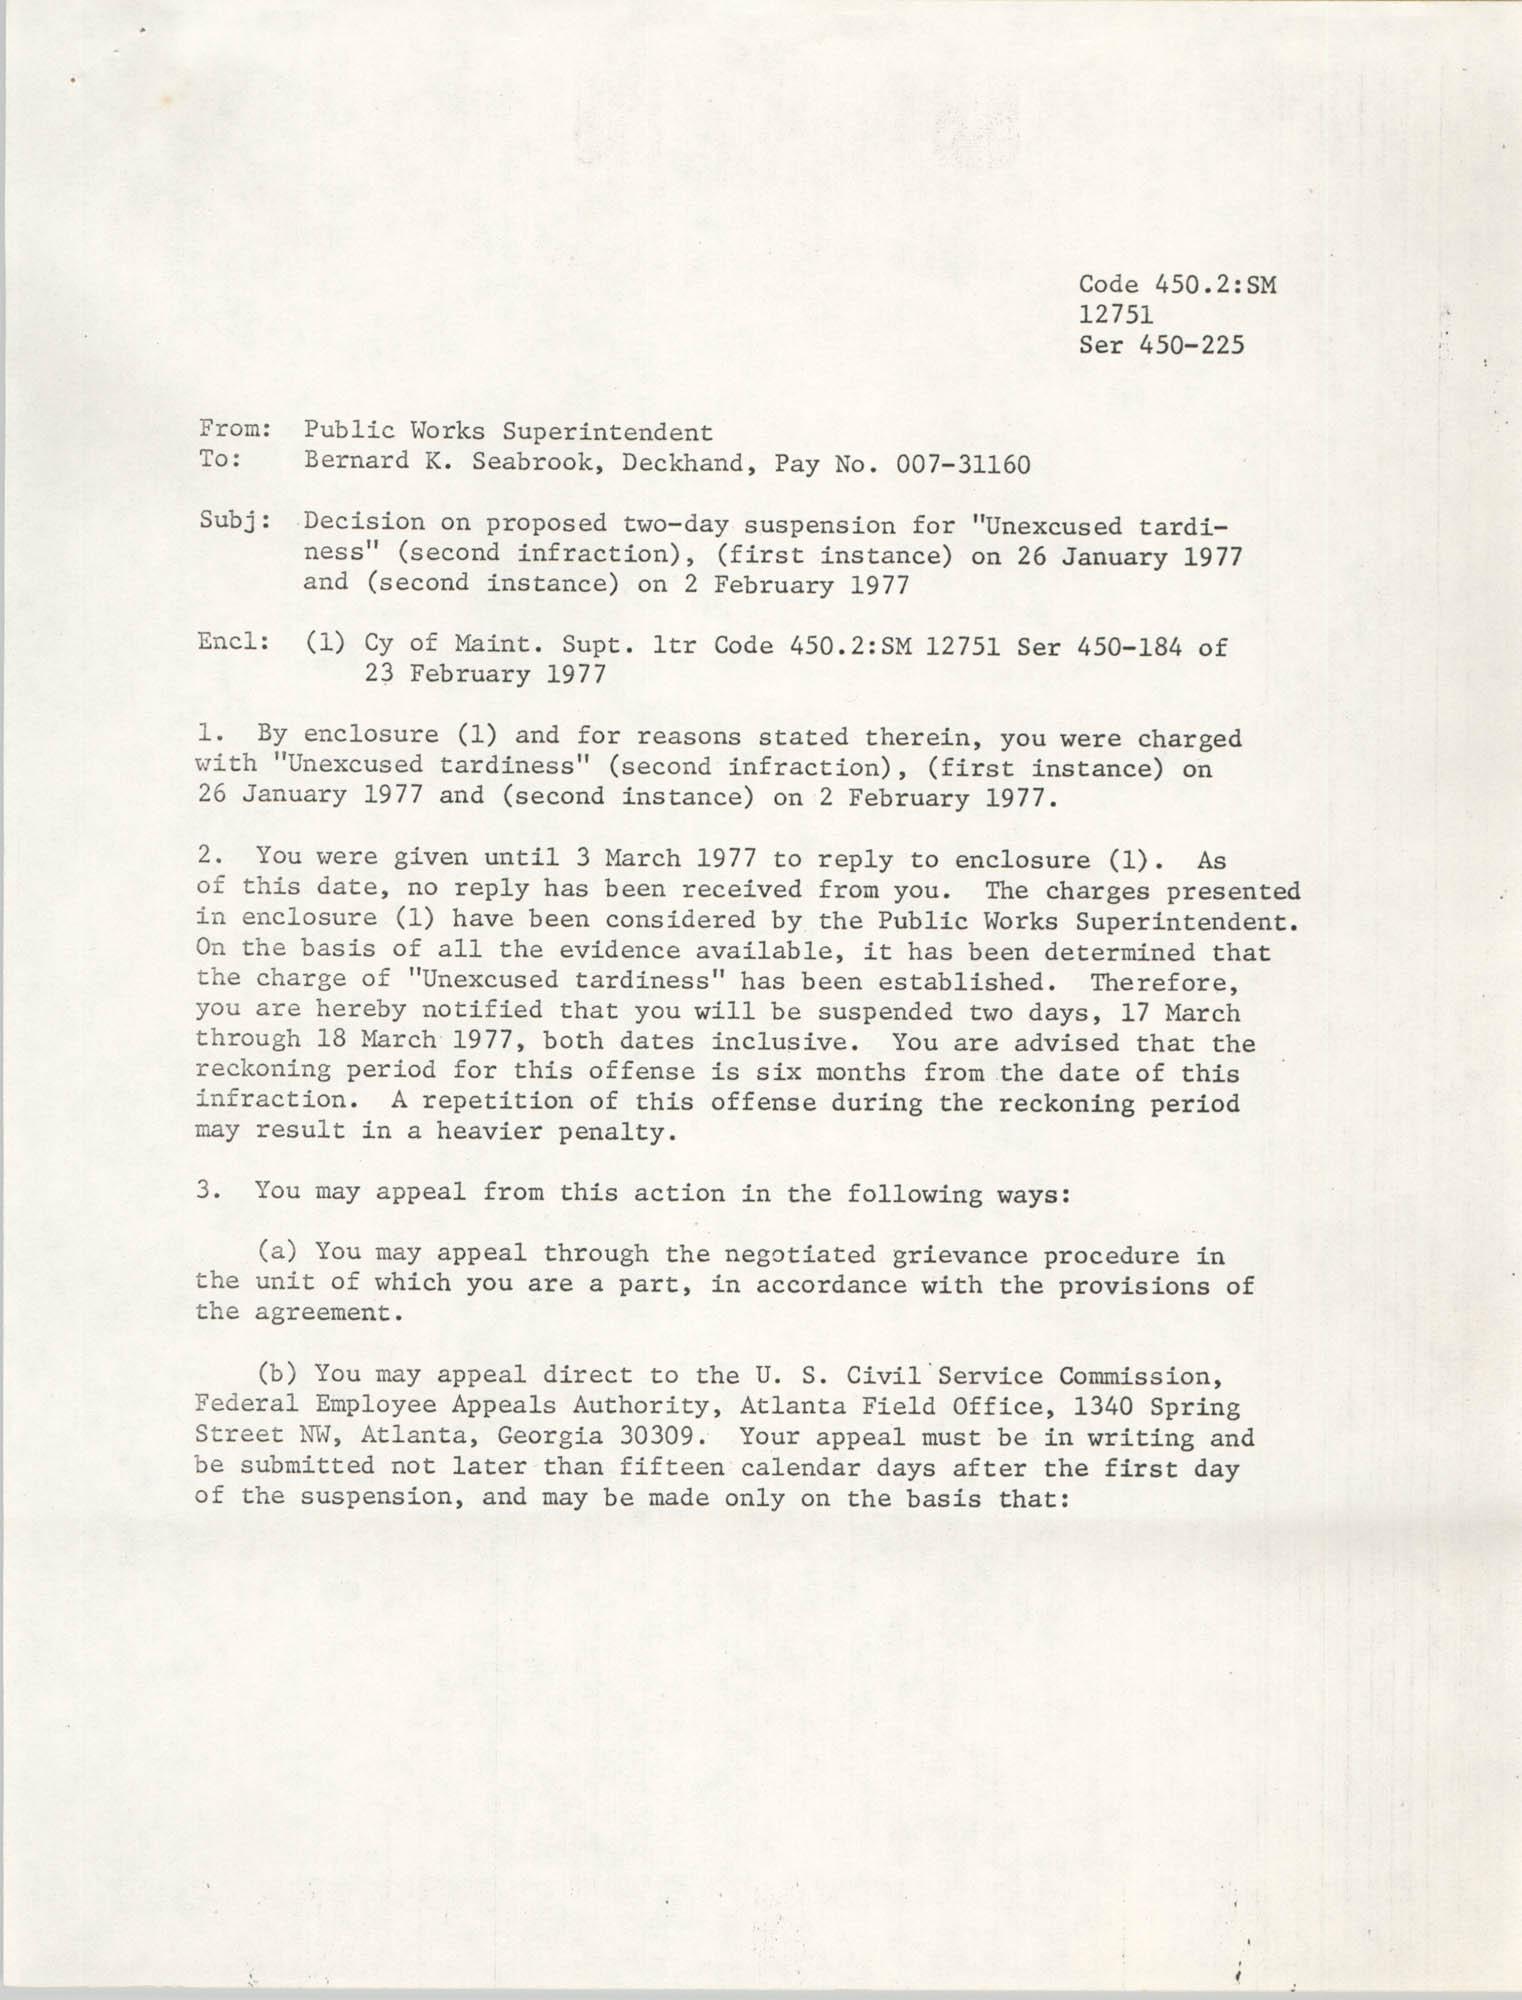 Memorandum, 1977